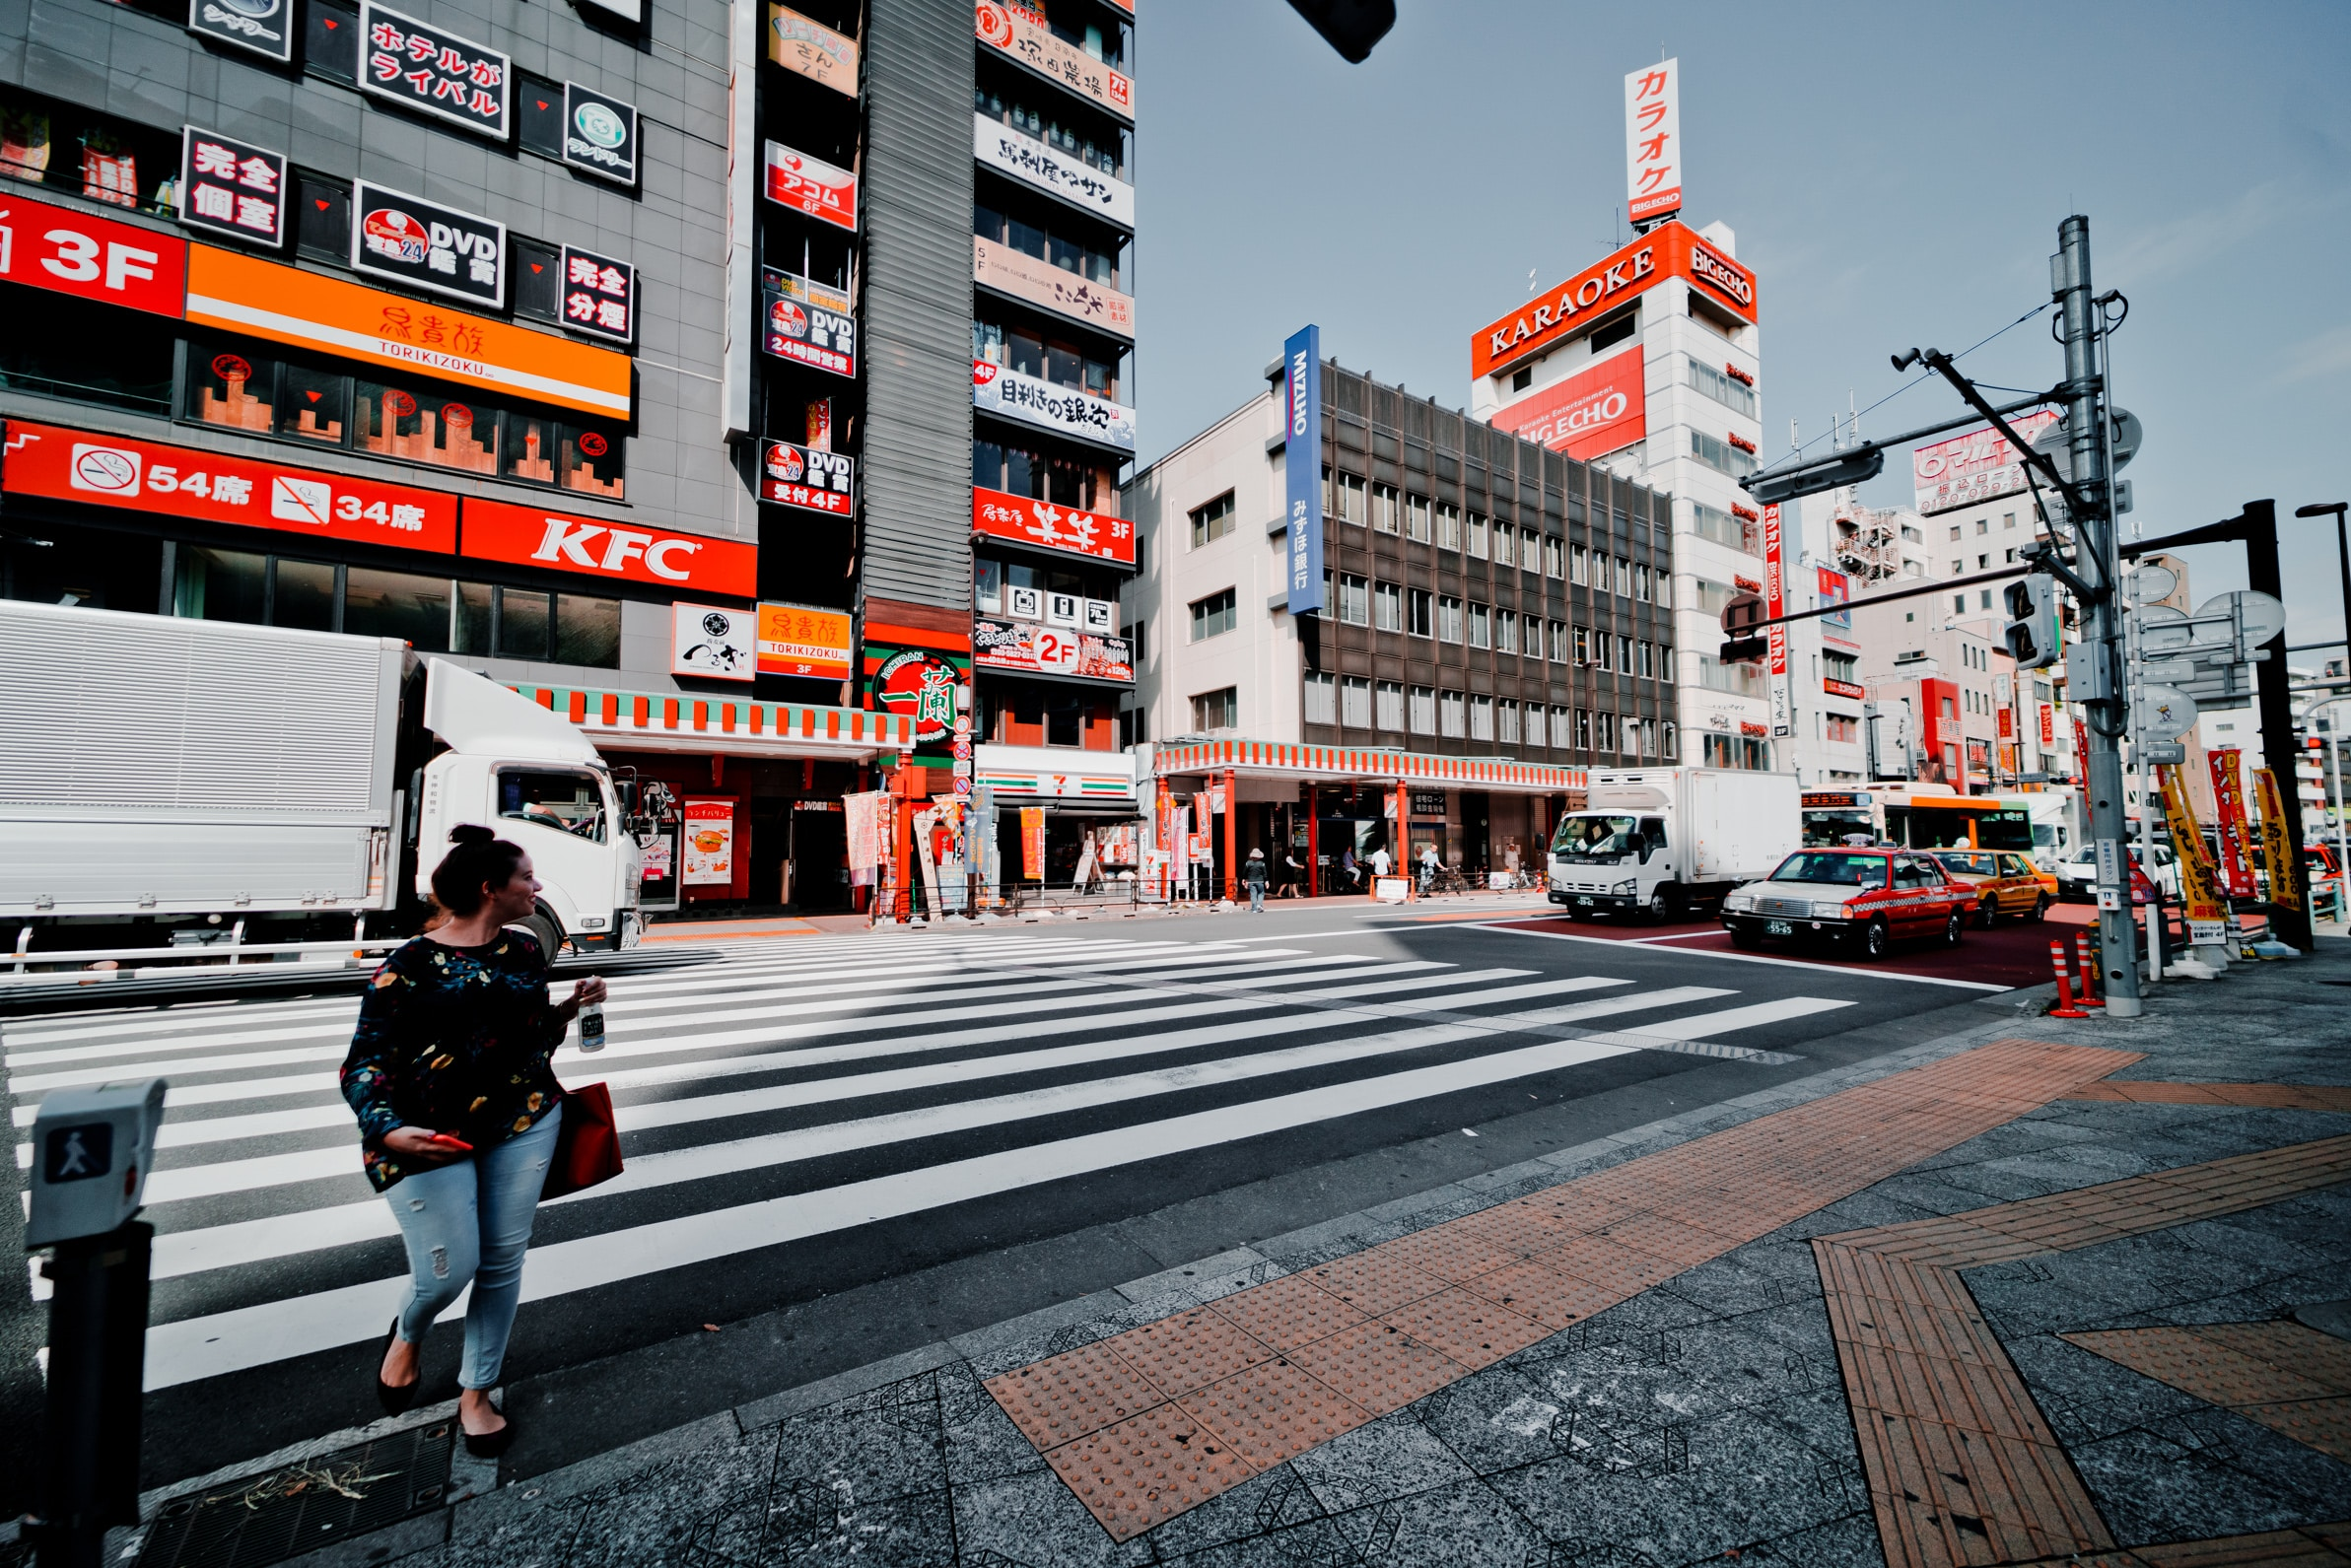 KFC restaurant in Tokyo, Japan